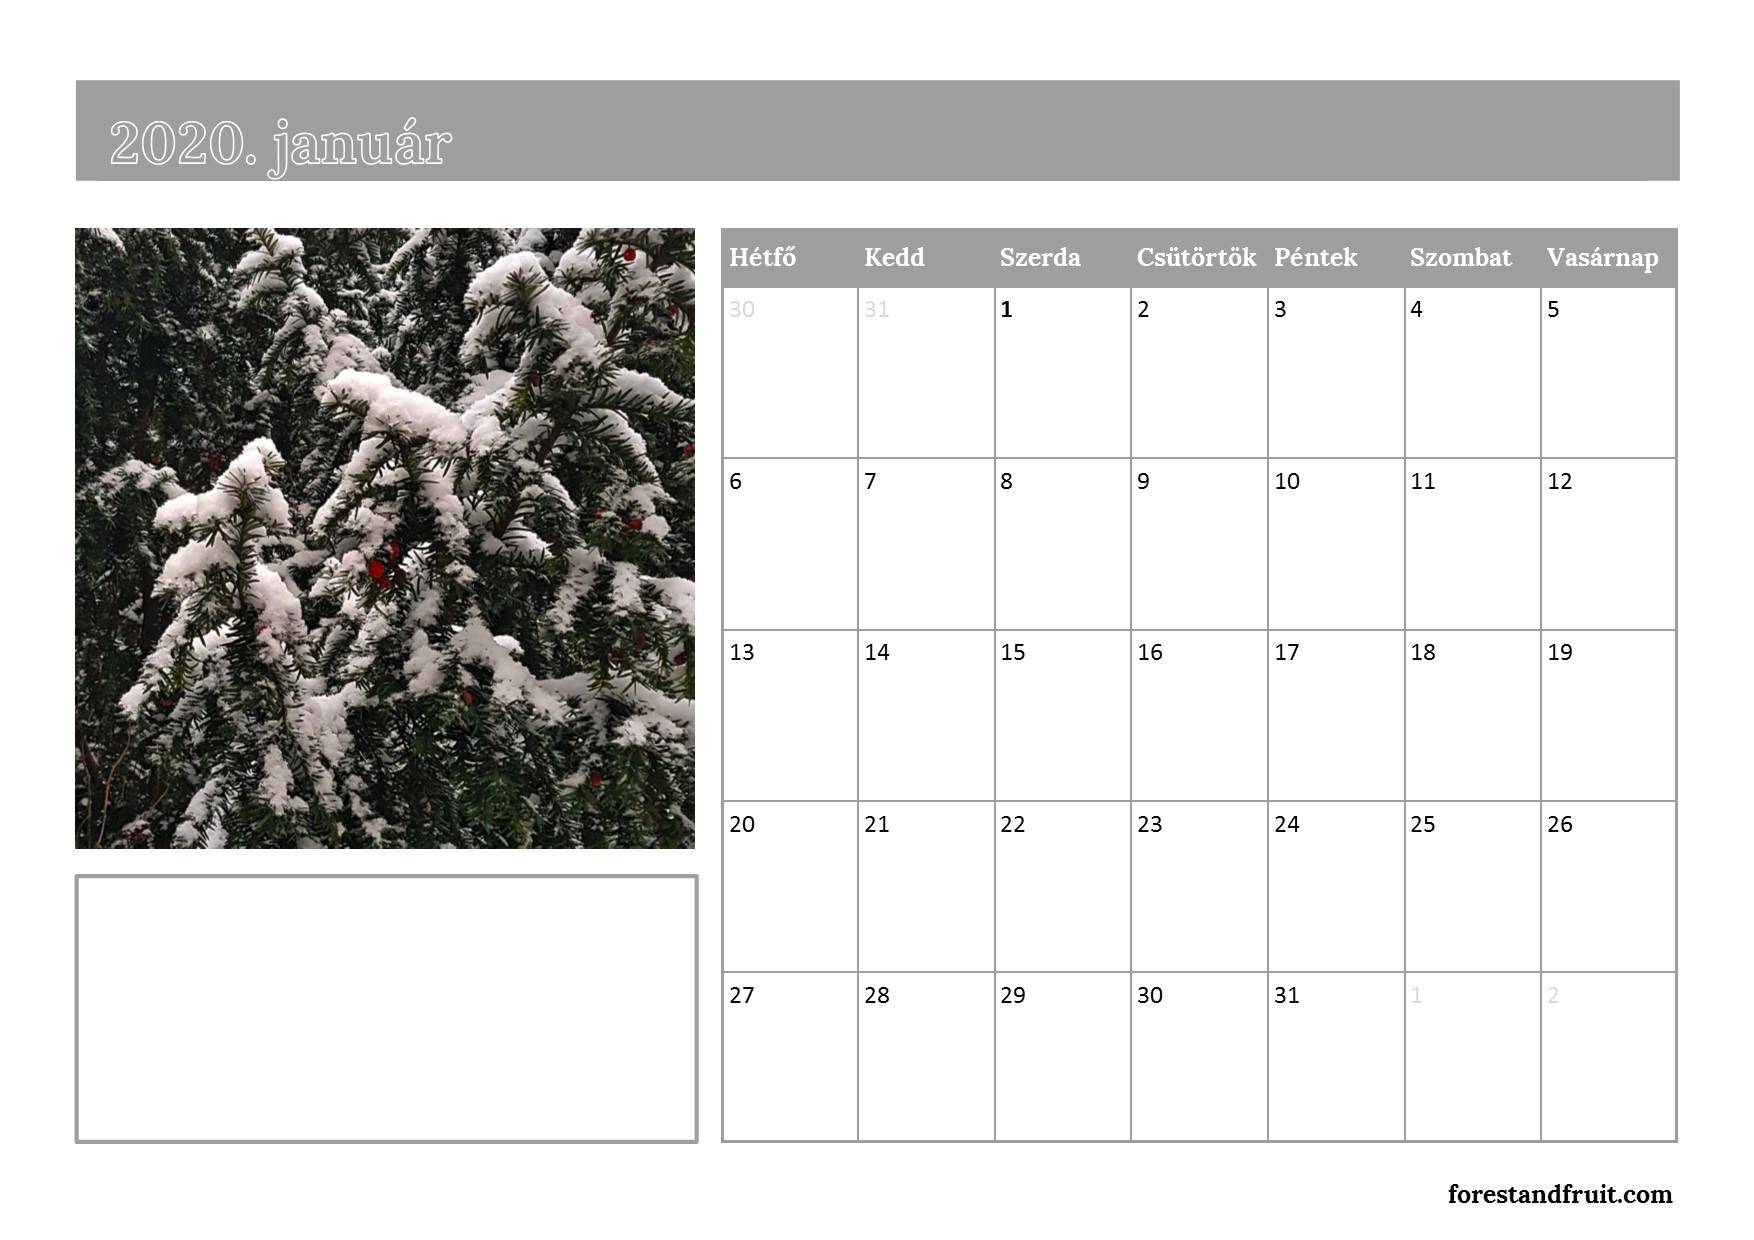 forestandfruitnaptar_2020_januar.jpg